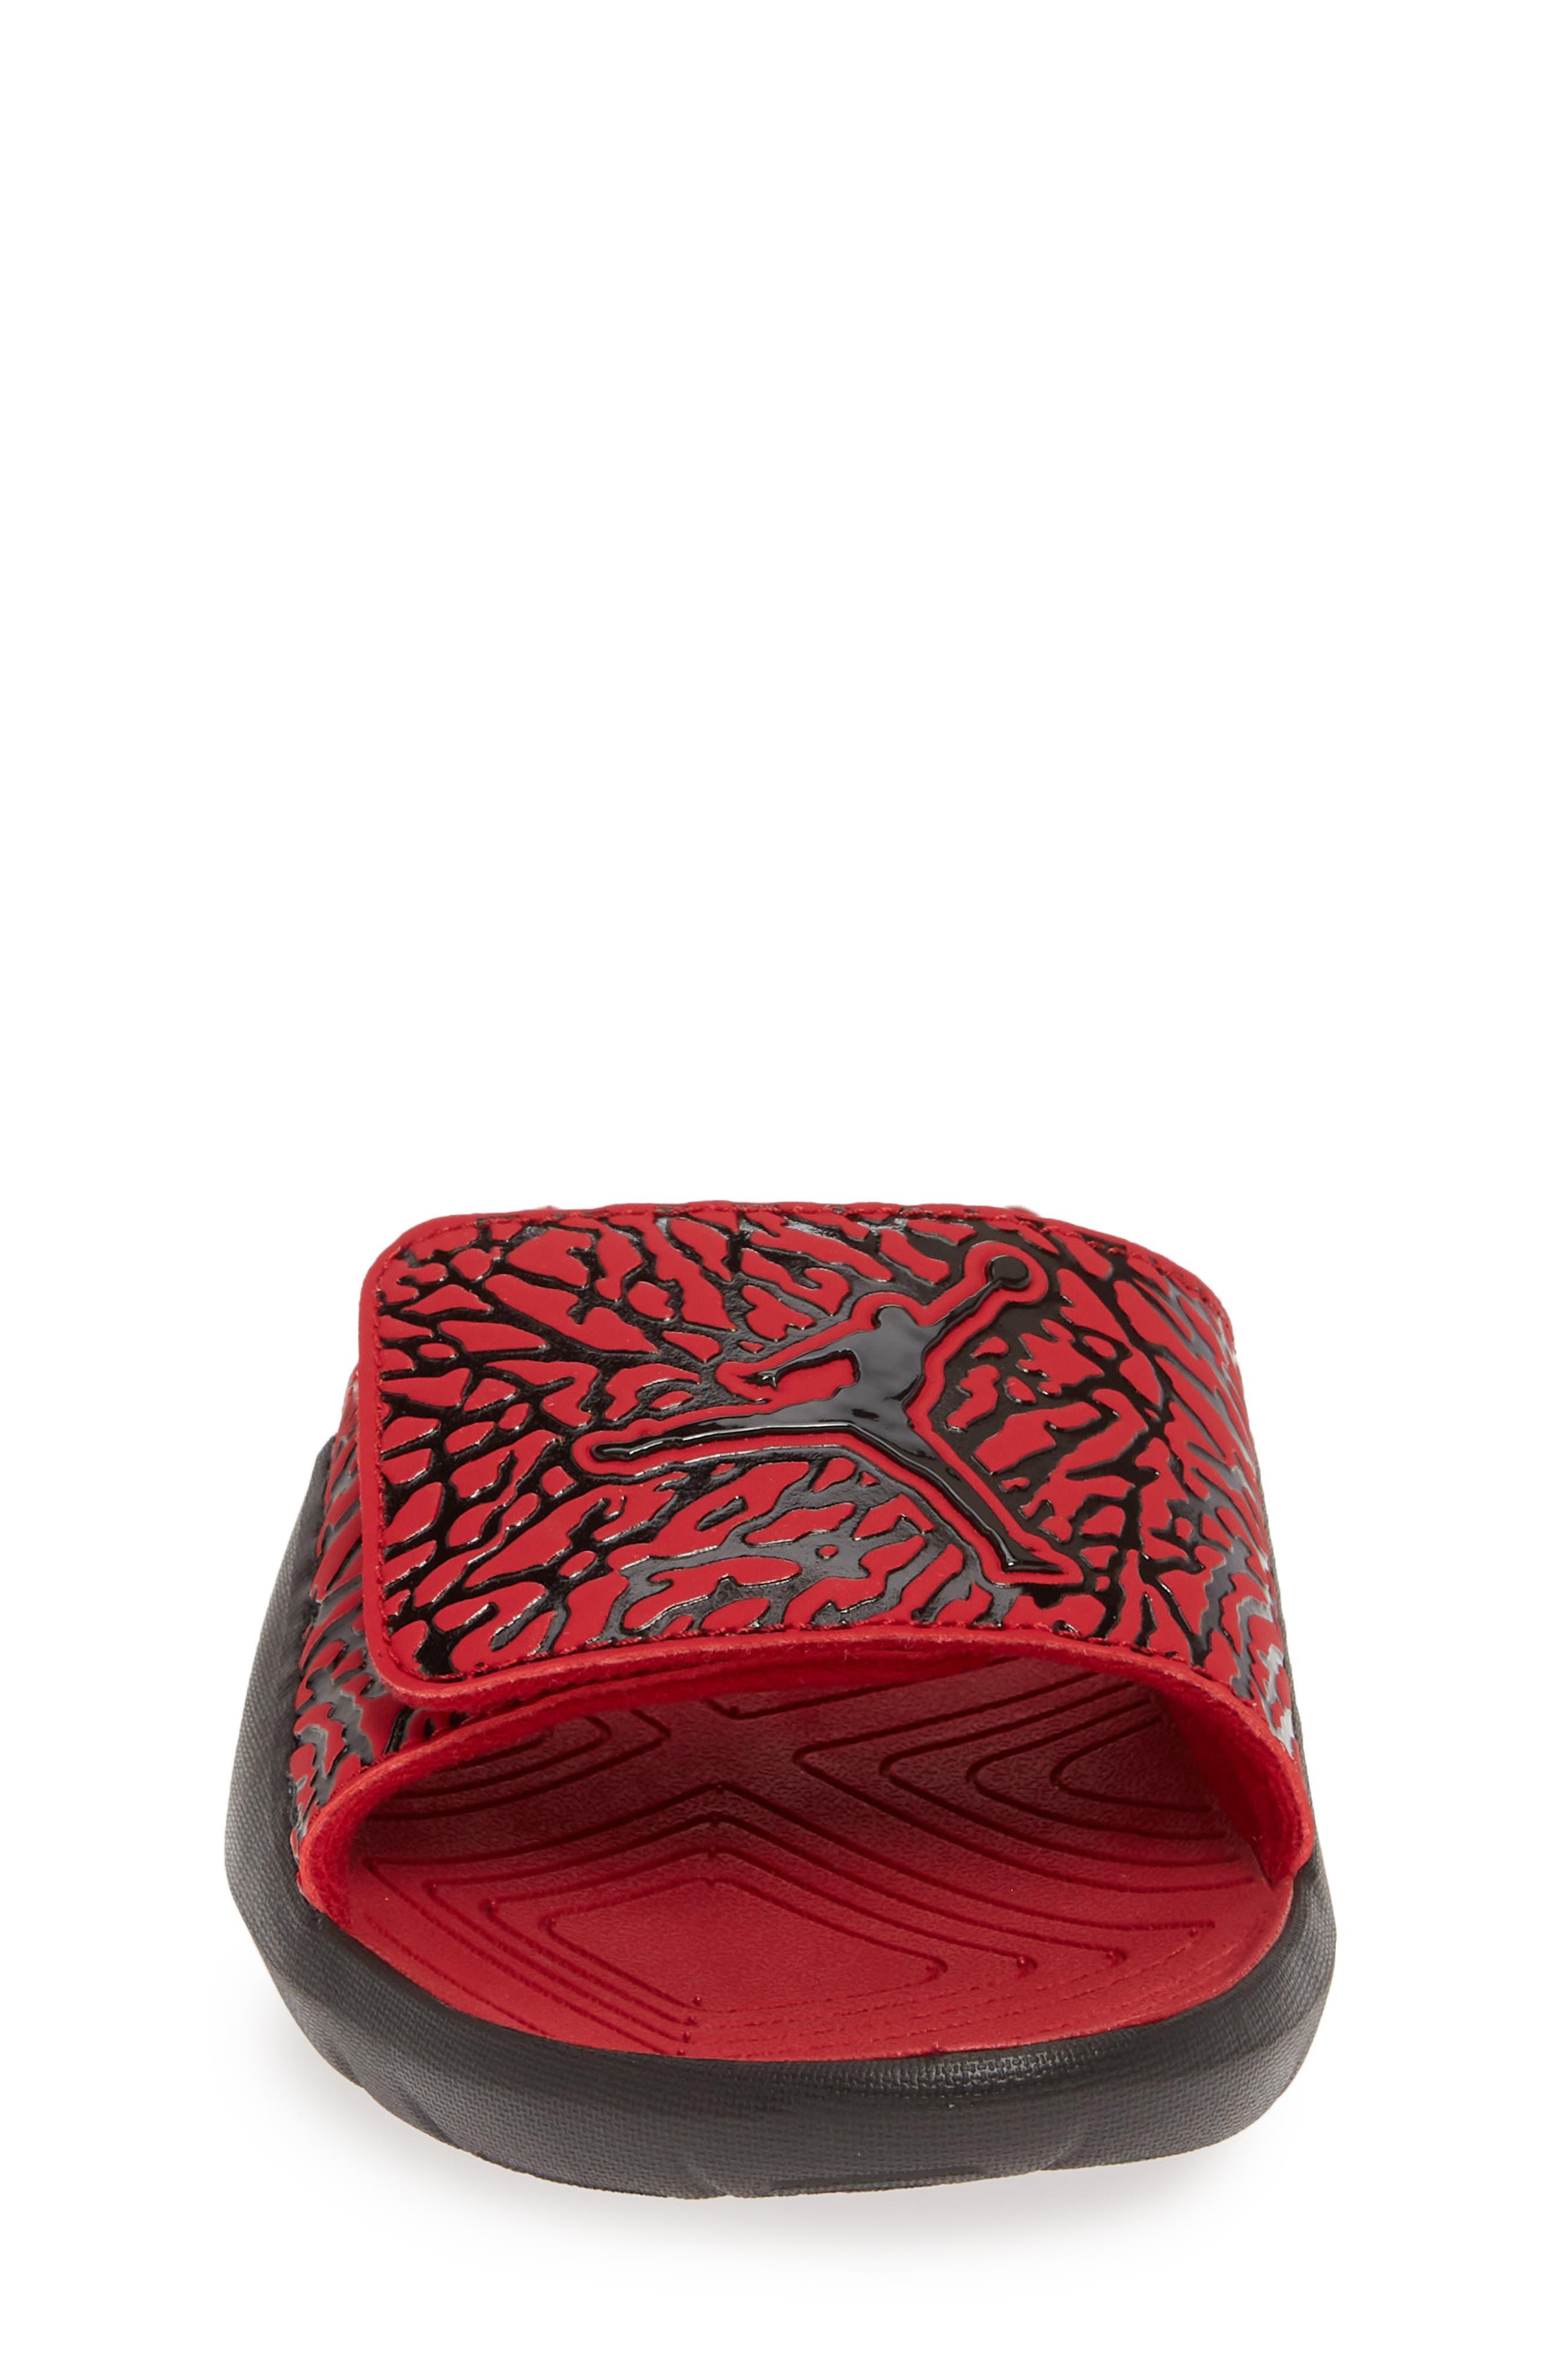 JORDAN, Hydro 7 V2 Sandal, Alternate thumbnail 4, color, GYM RED/ BLACK